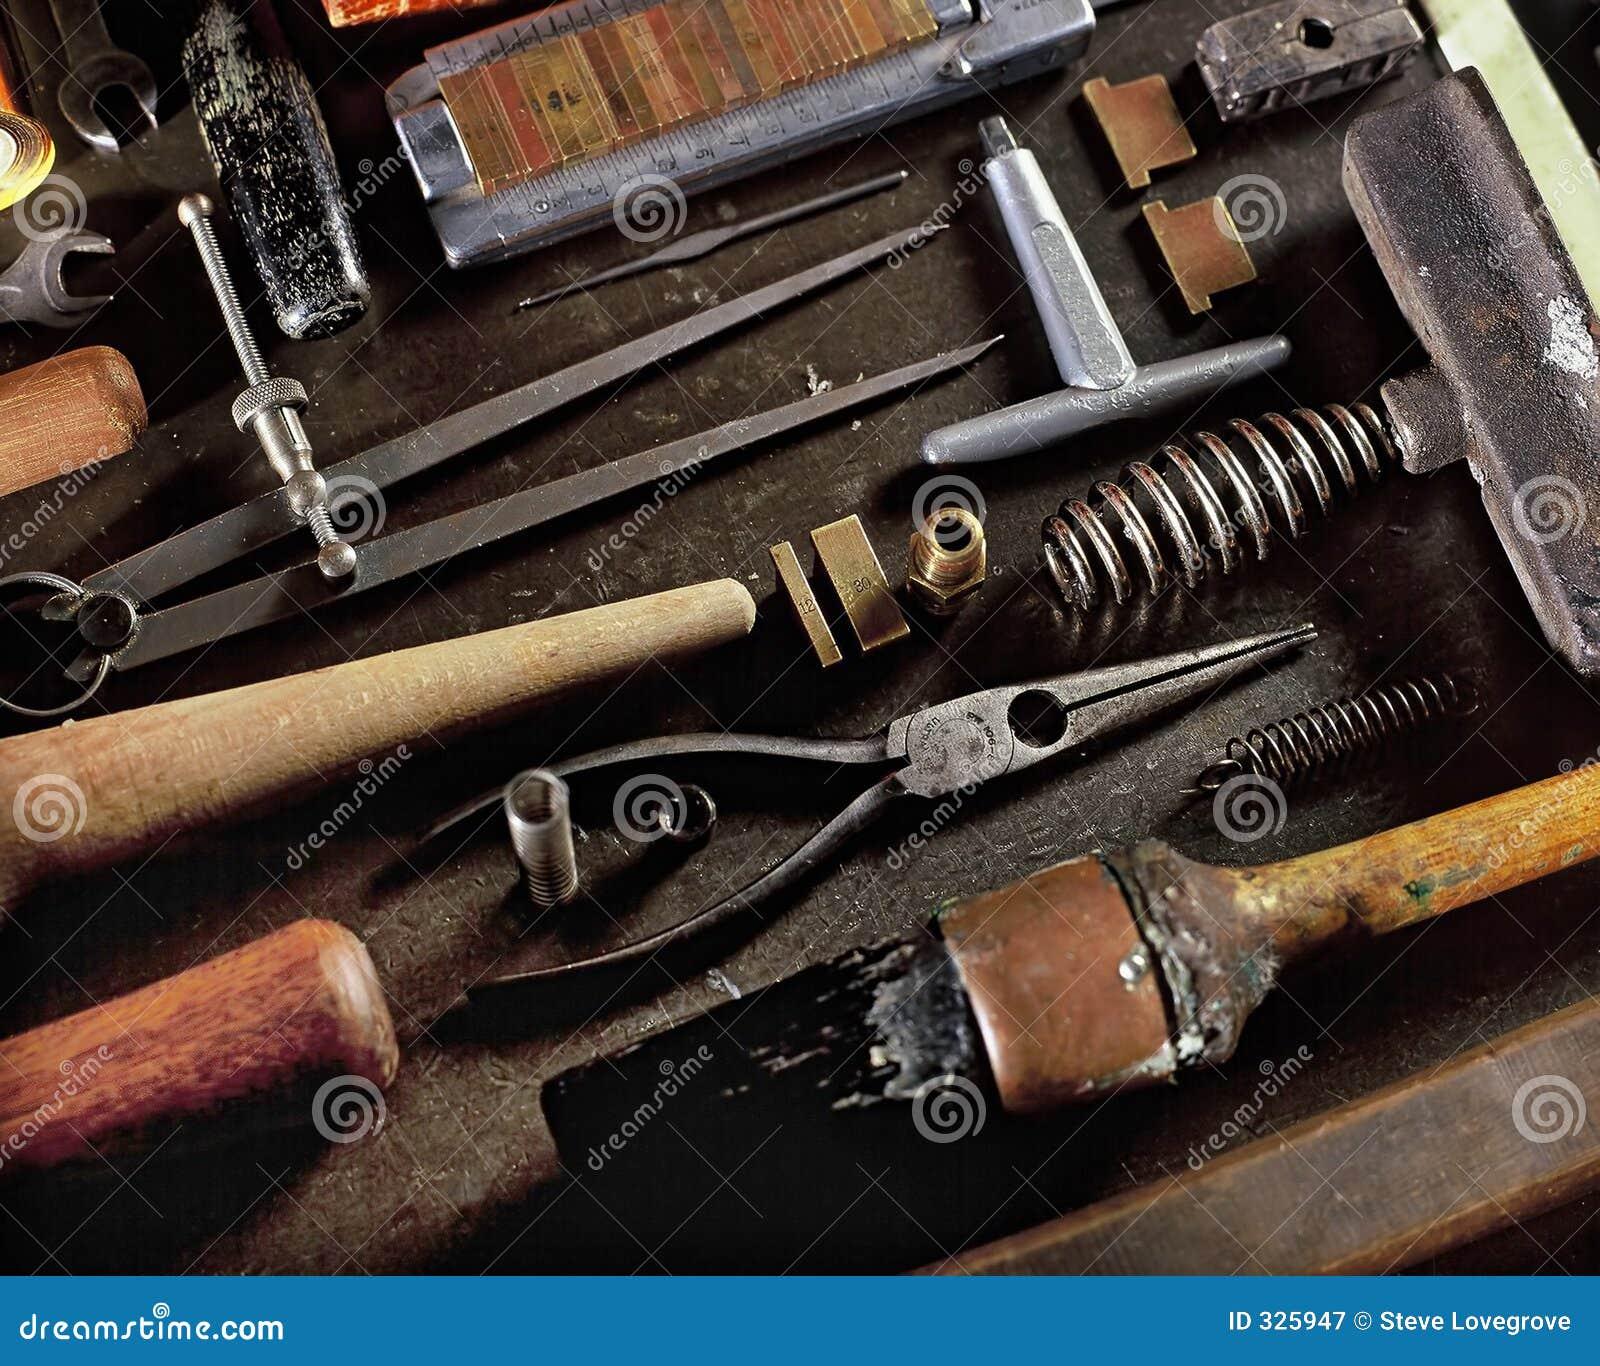 Bookbinding Tools